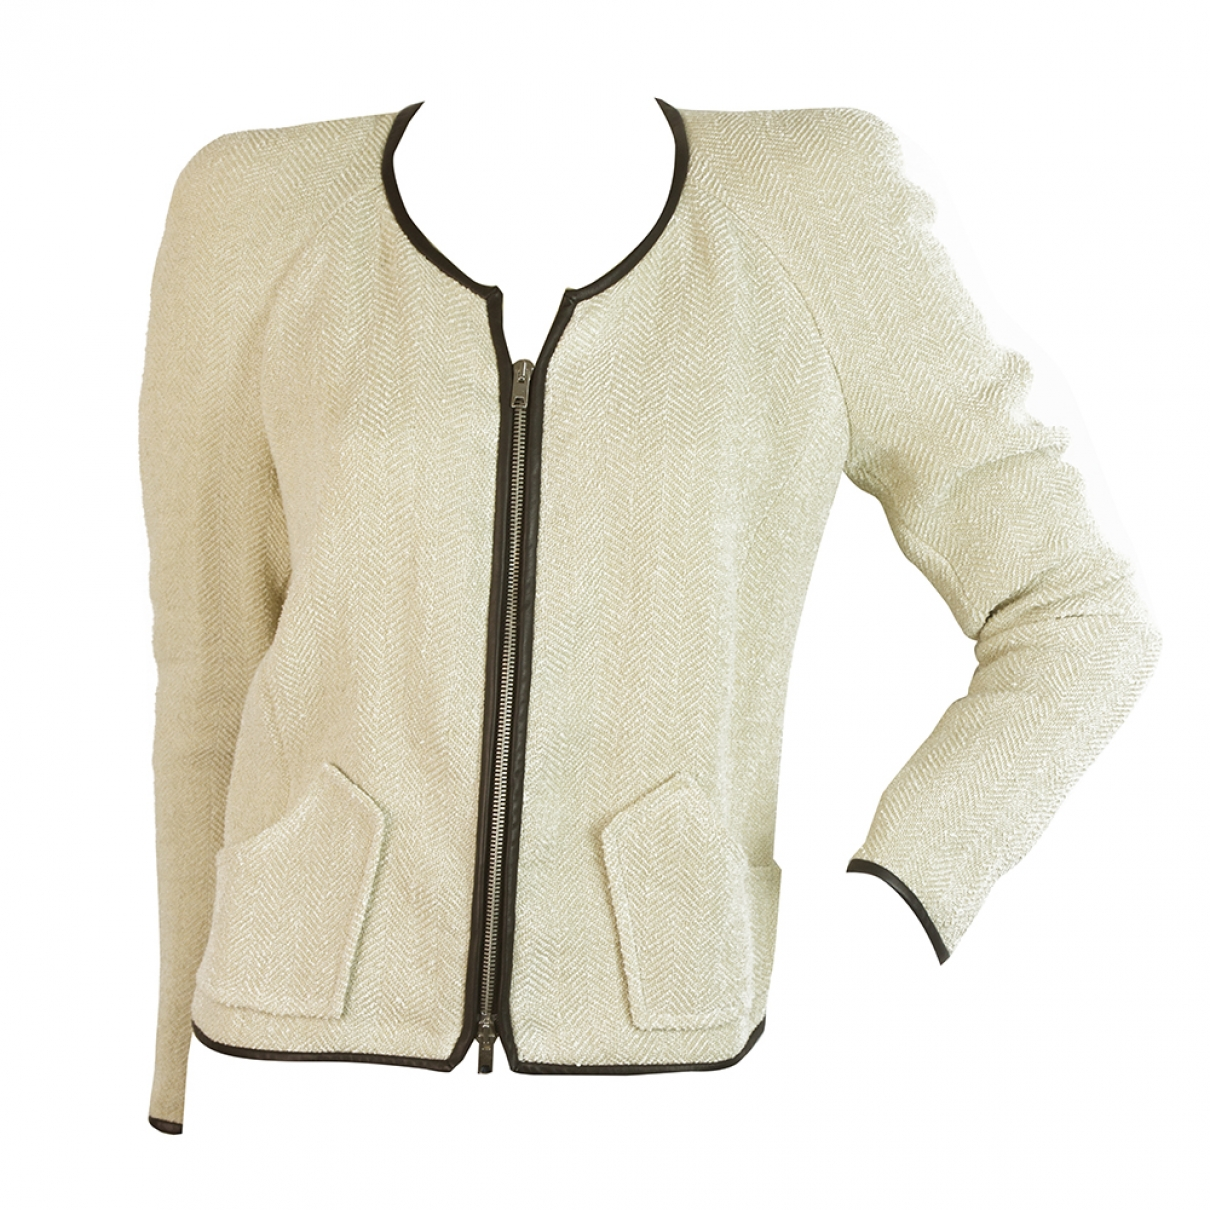 Isabel Marant \N Ecru Linen jacket for Women 2 0-5